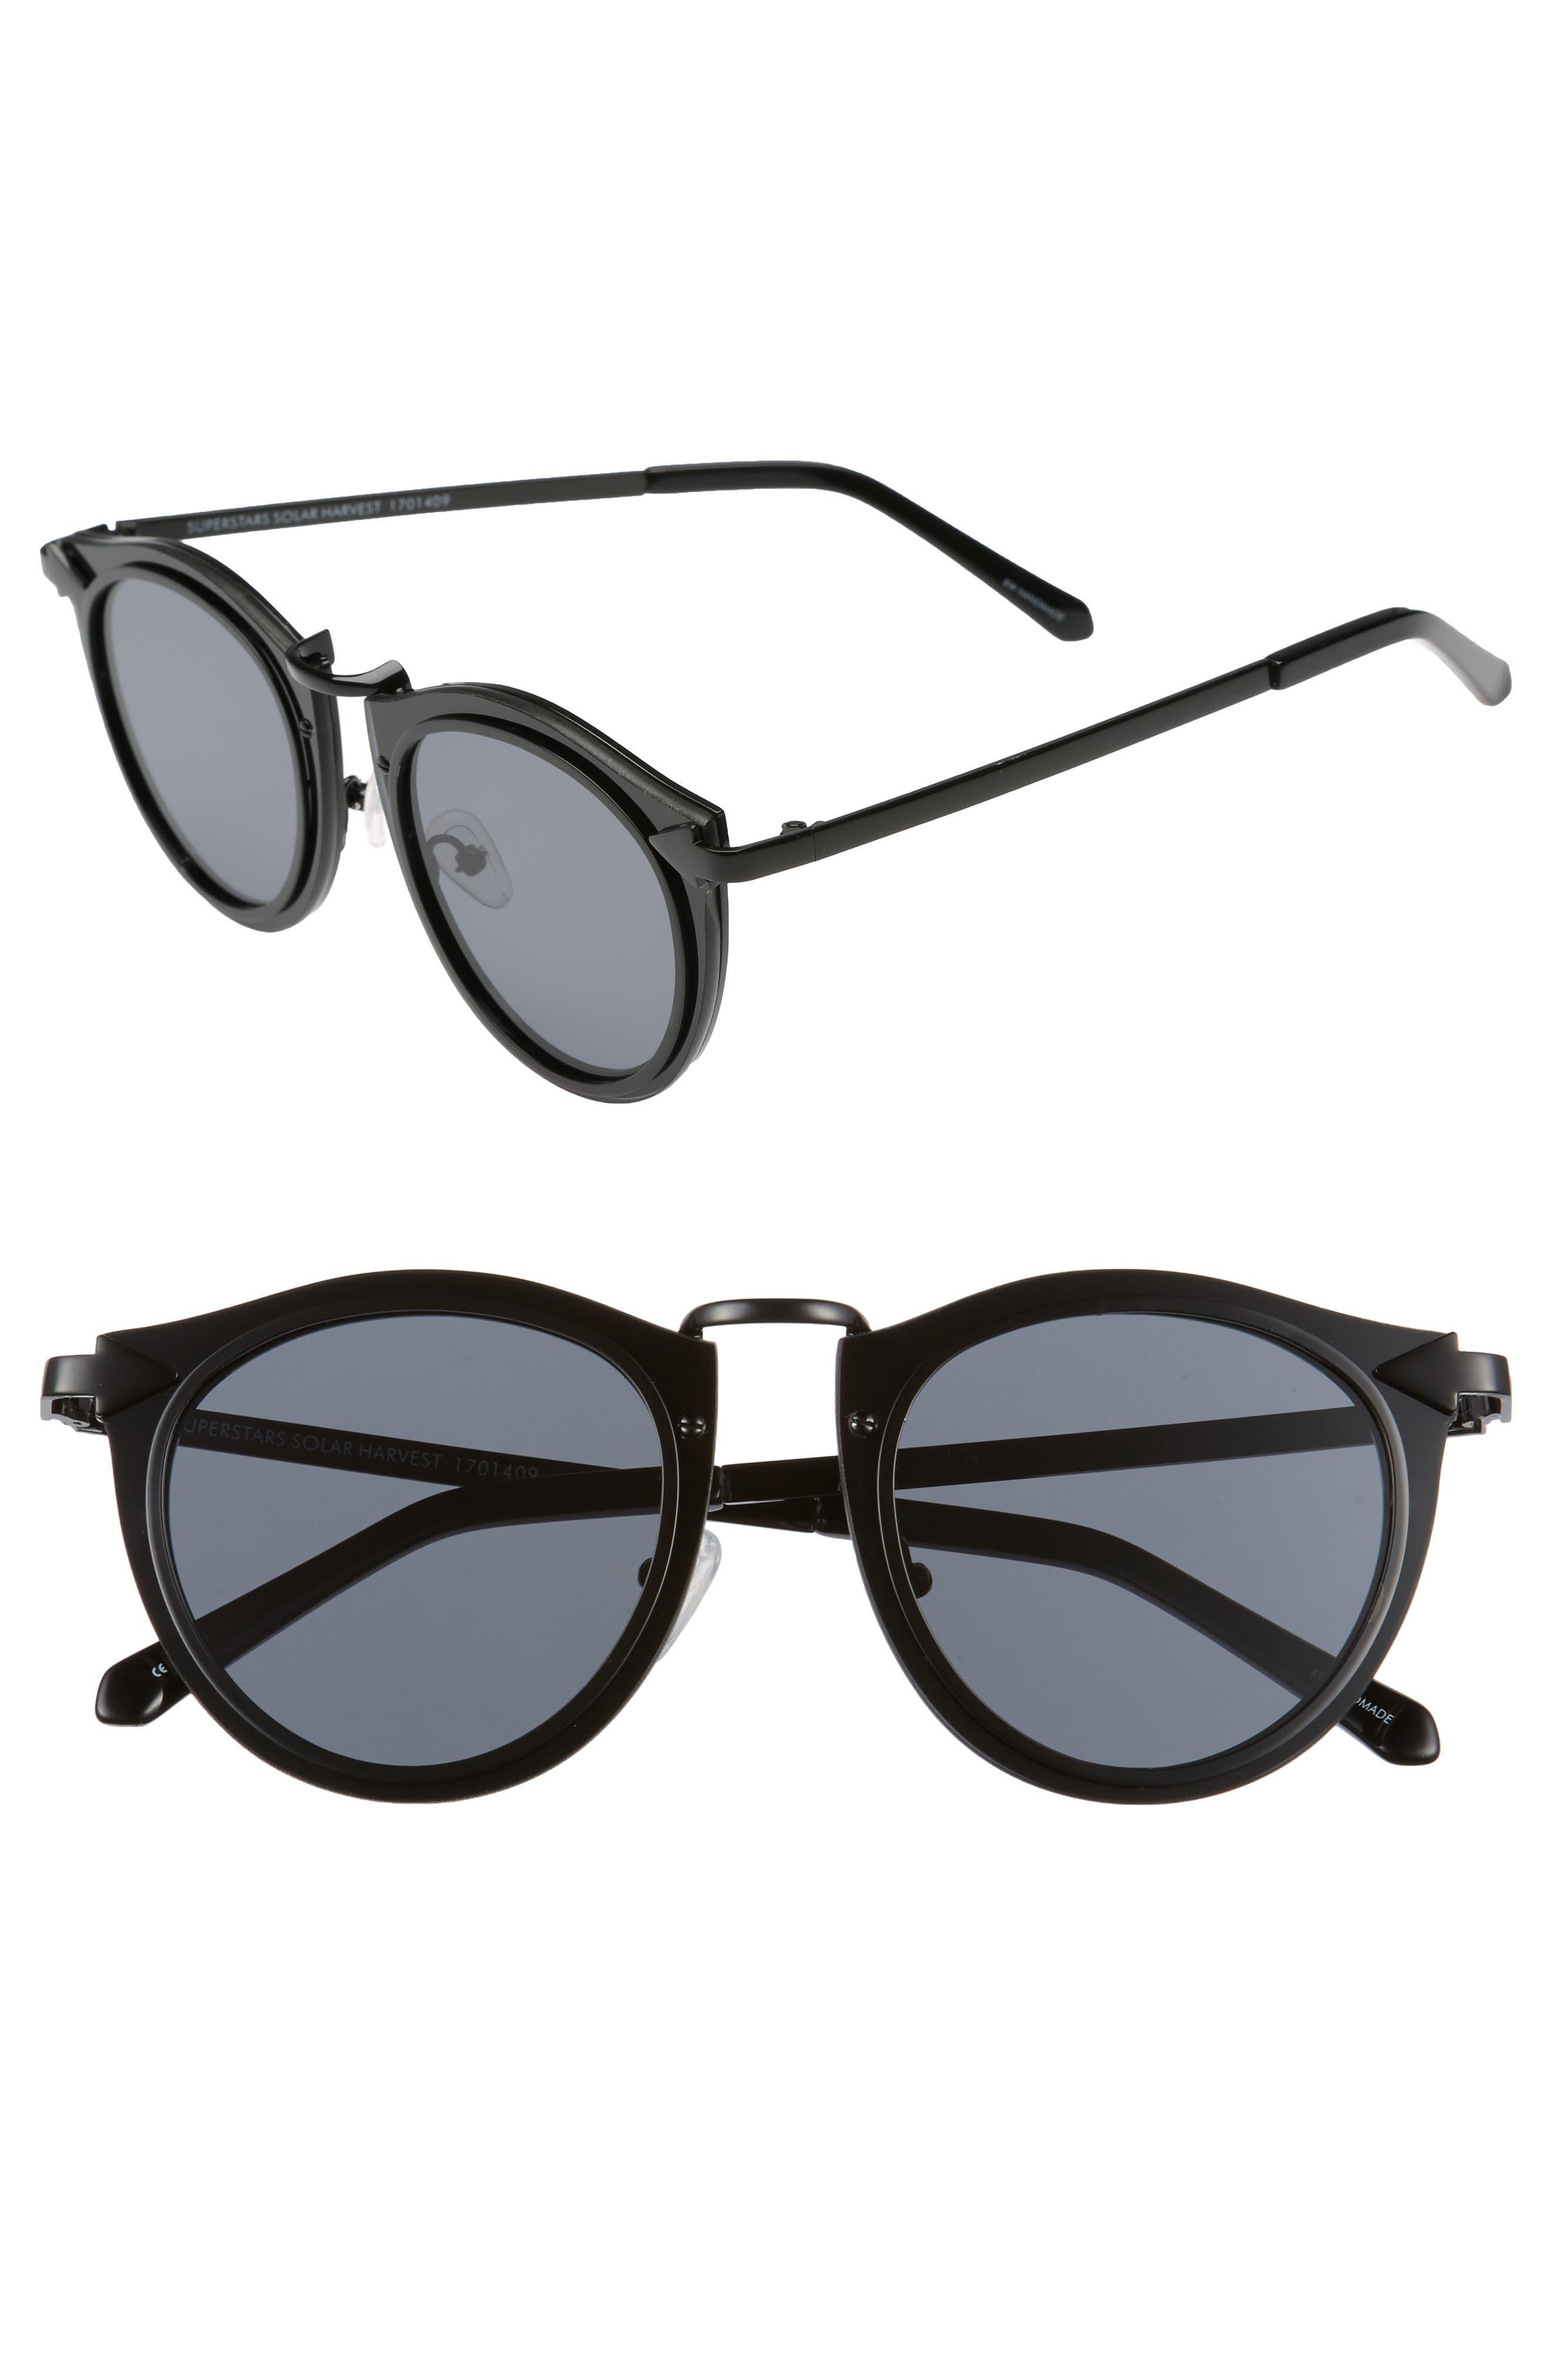 Superstars - Solar 50mm Retro Sunglasses,                         Main,                         color, 001